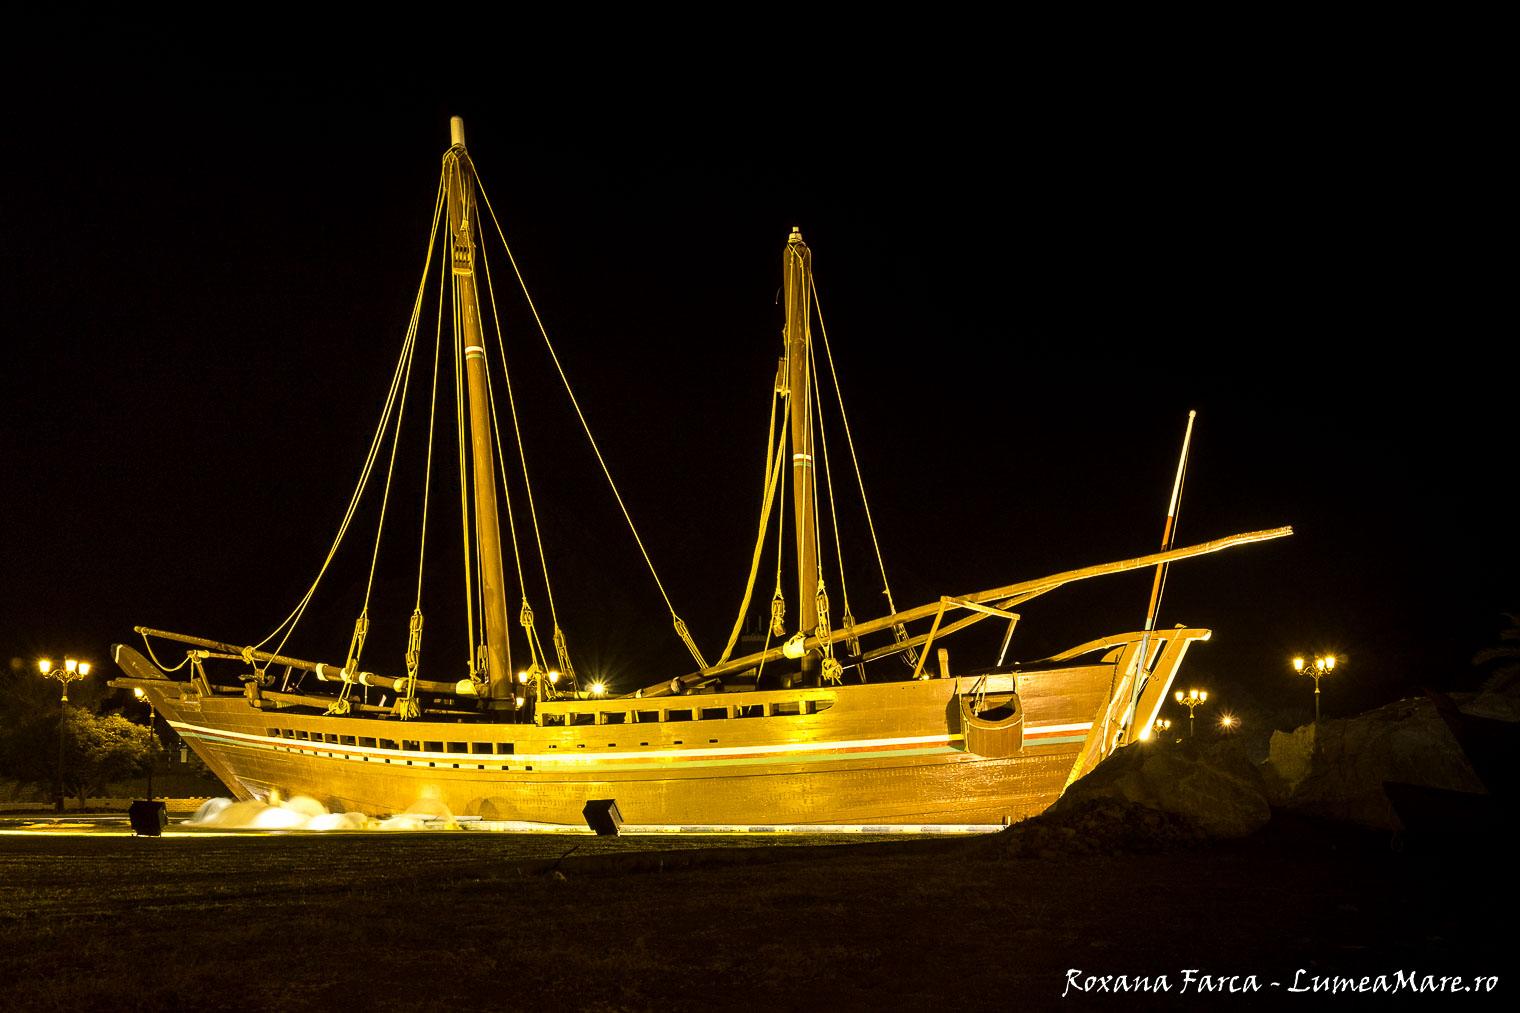 Oman-Sohar-boat-0808